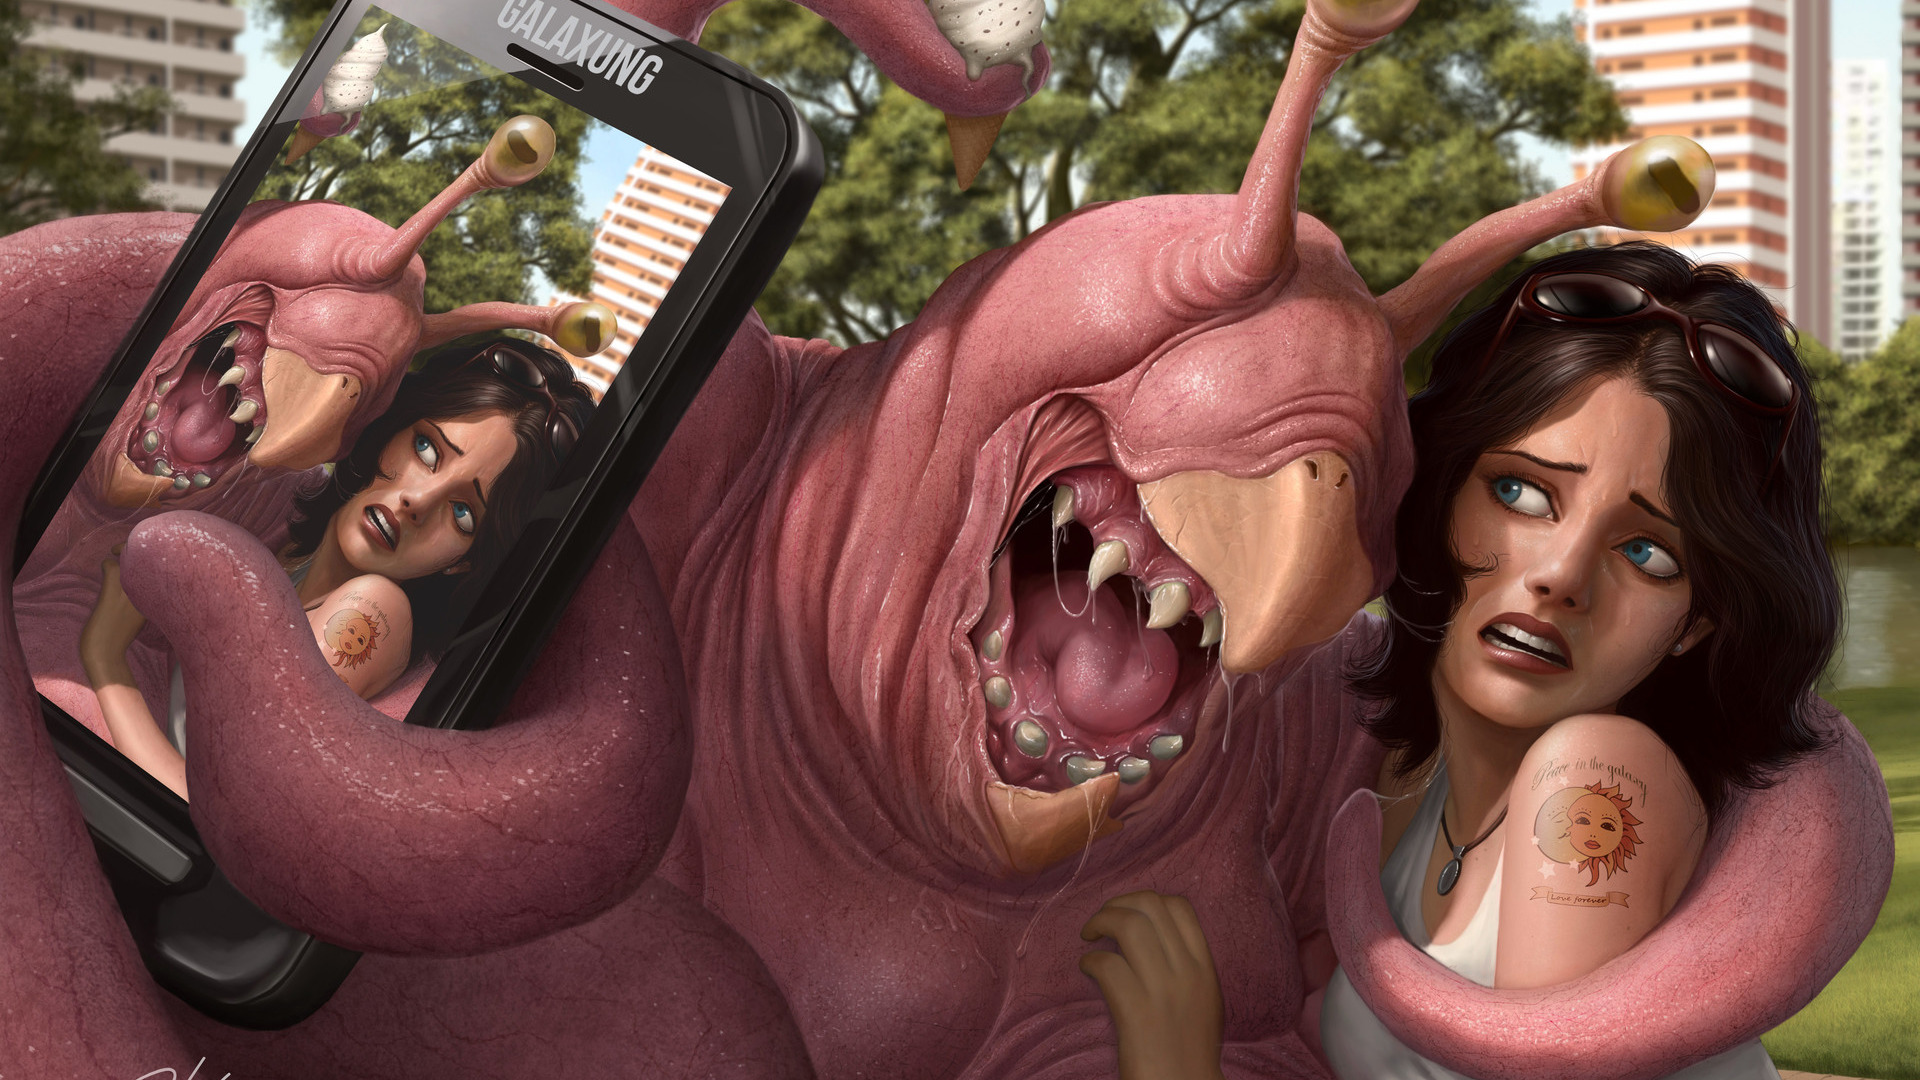 Monster dildol picsgay fucks gallery